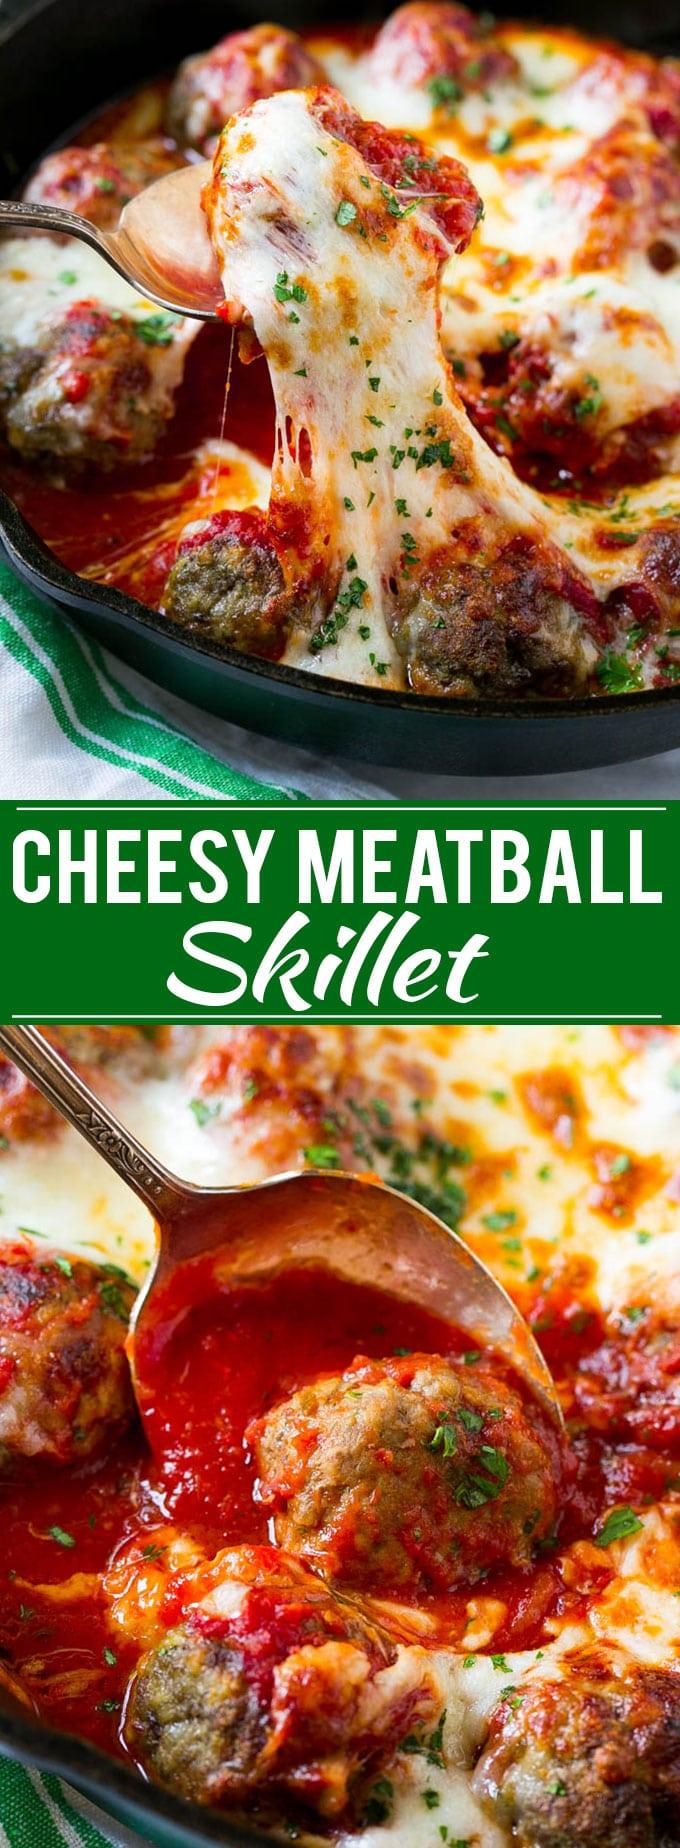 Cheesy Meatball Bake Recipe | Meatball Skillet | Italian Meatballs | Baked Meatball Recipe #meatballs #beef #cheese #dinner #dinneratthezoo